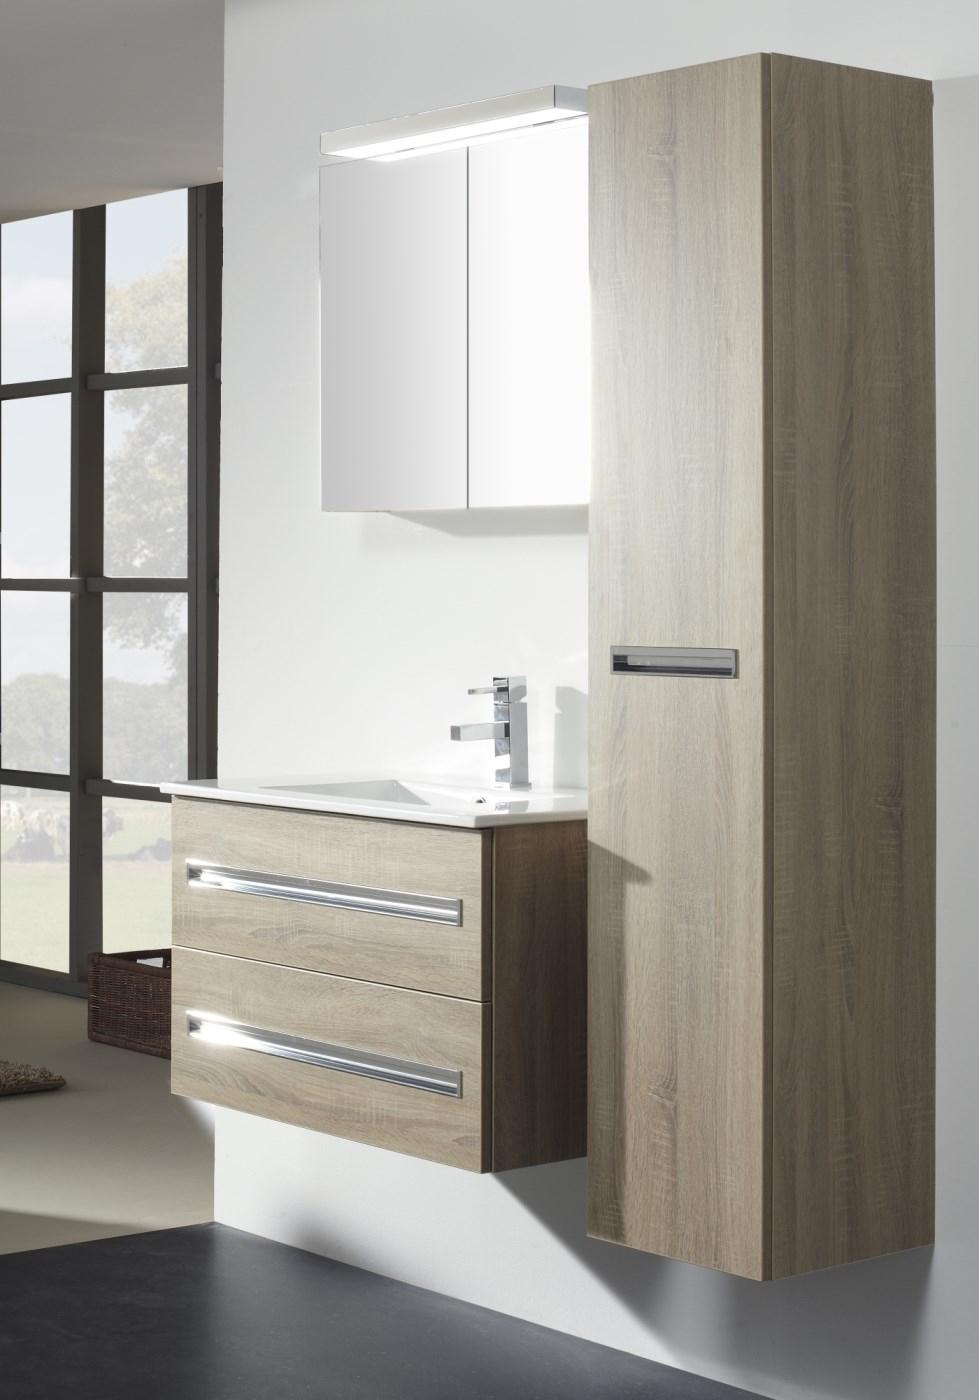 Hoge Smalle Badkamerkast.Badkamerkast De Ruimtewinner In De Badkamer Het Laatste